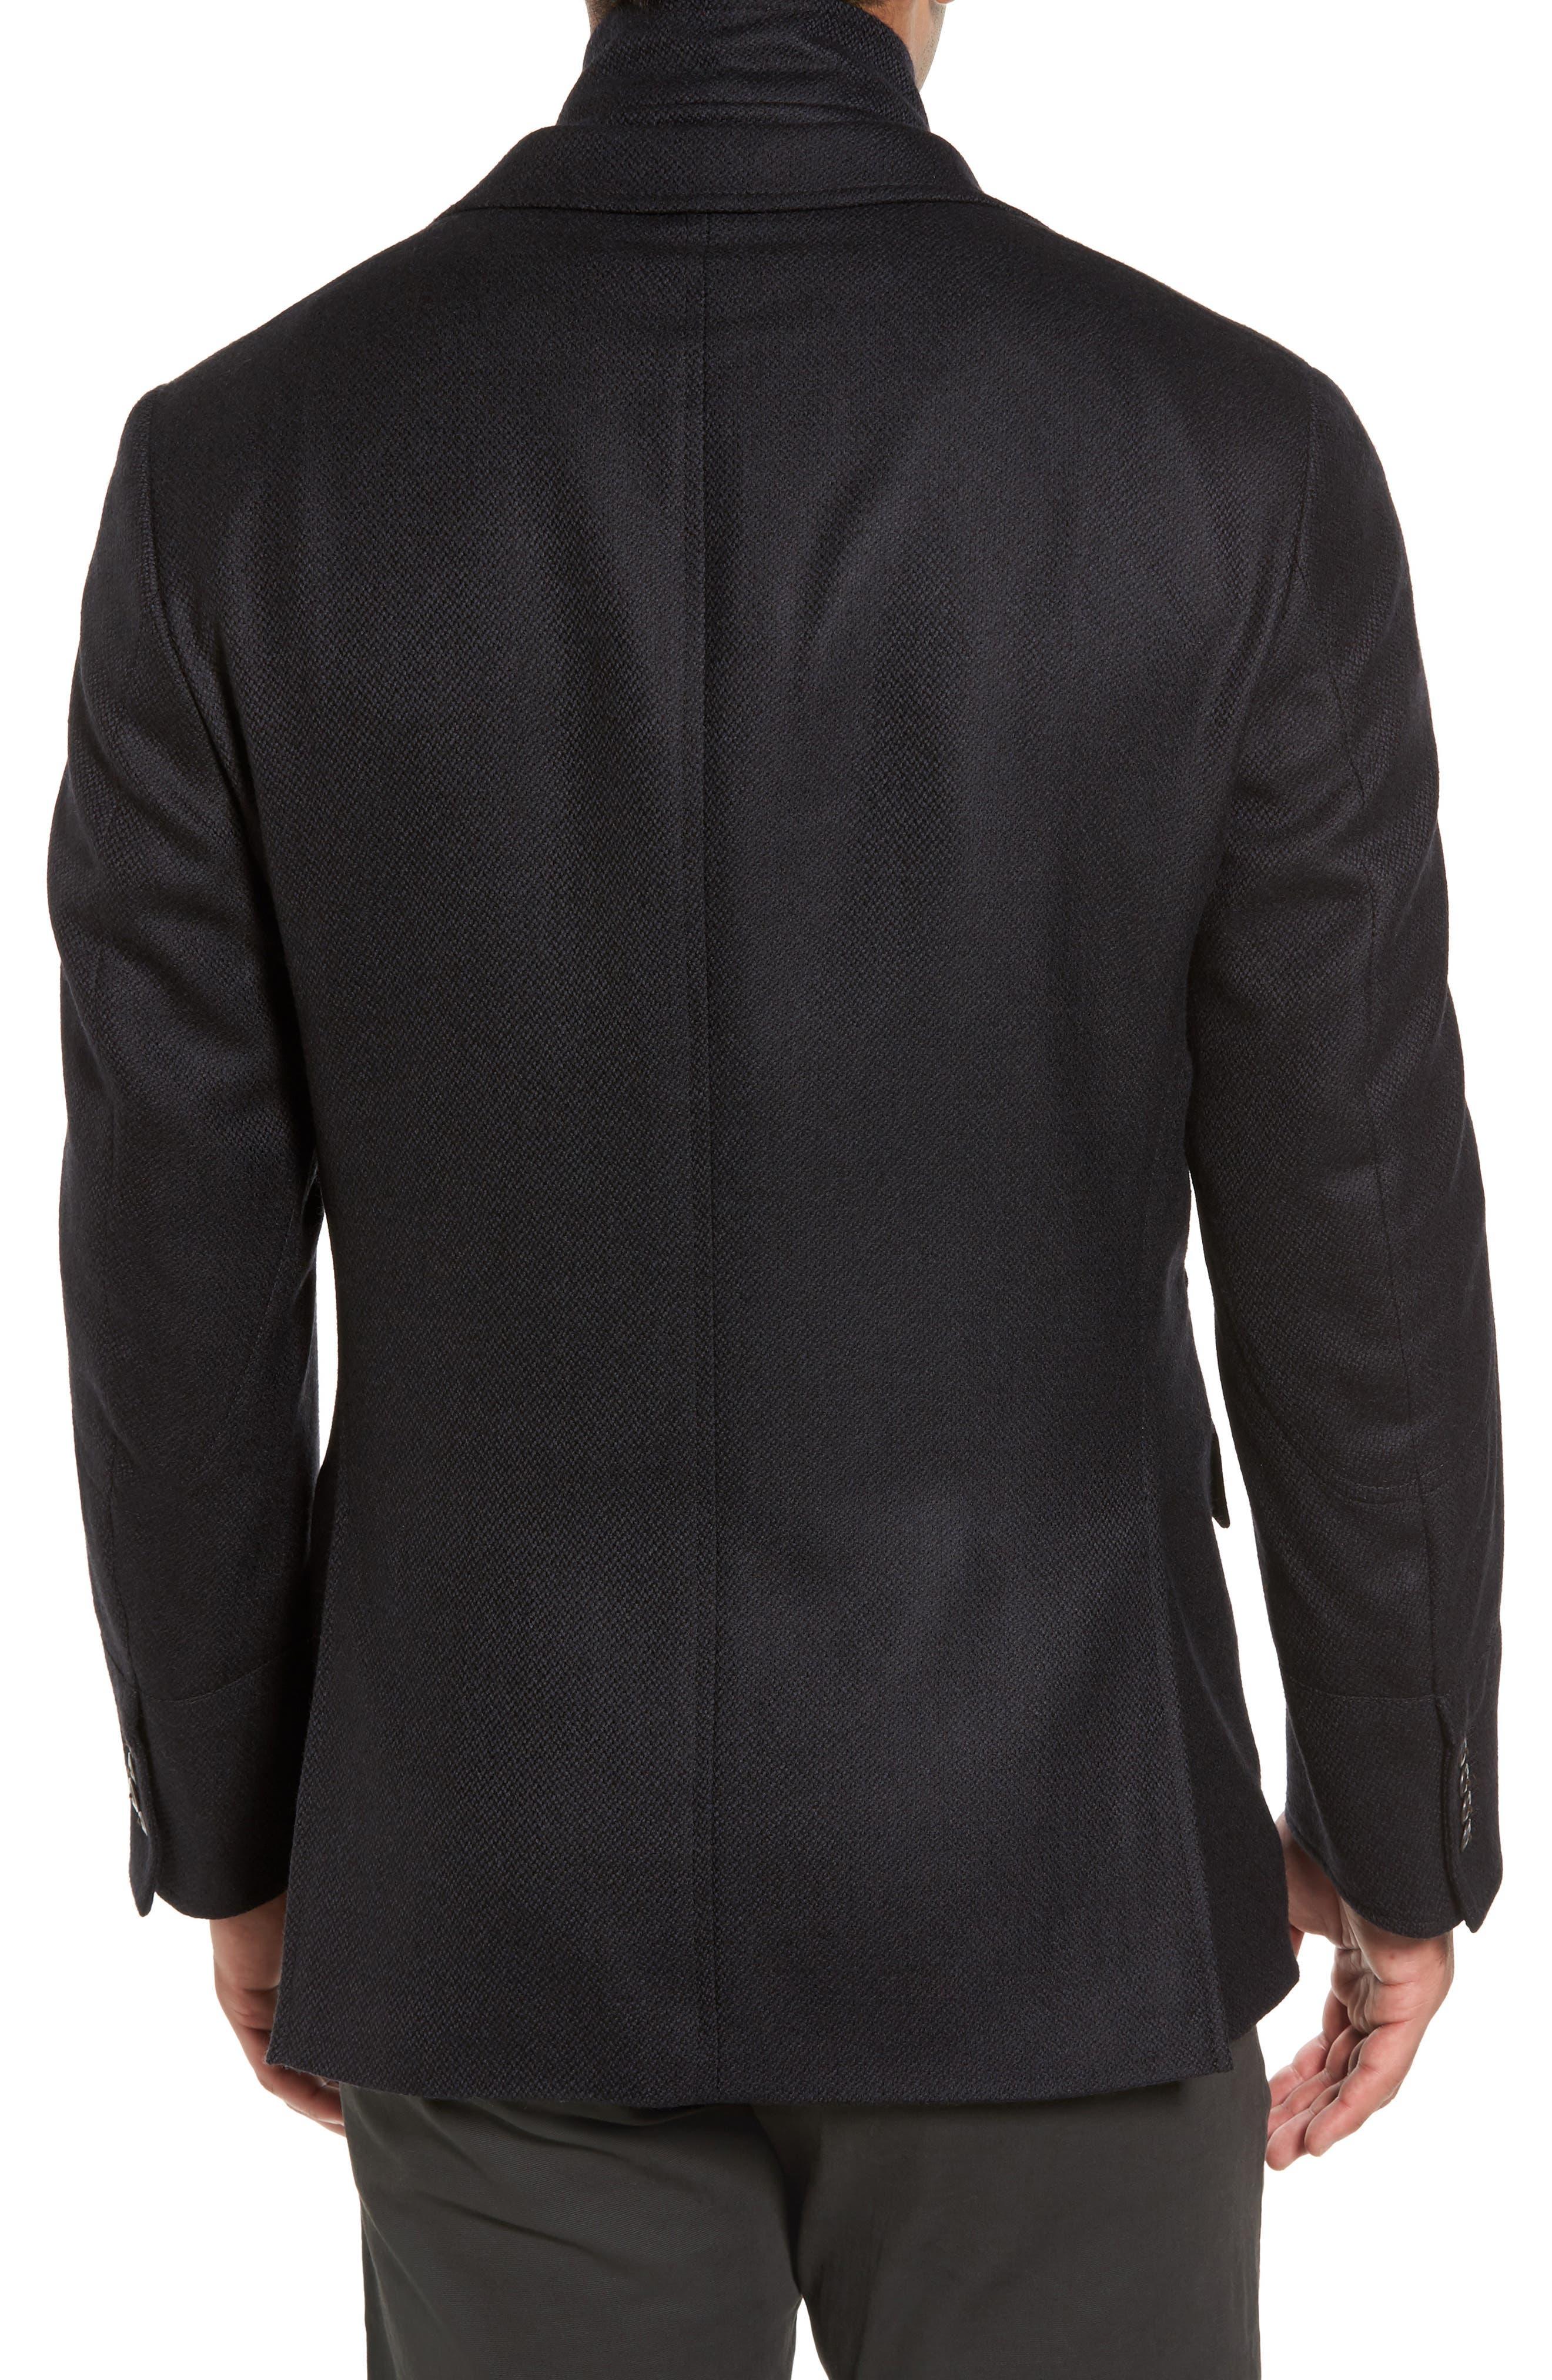 Ritchie Aim Hybrid Classic Fit Wool & Cashmere Sport Coat,                             Alternate thumbnail 2, color,                             Black